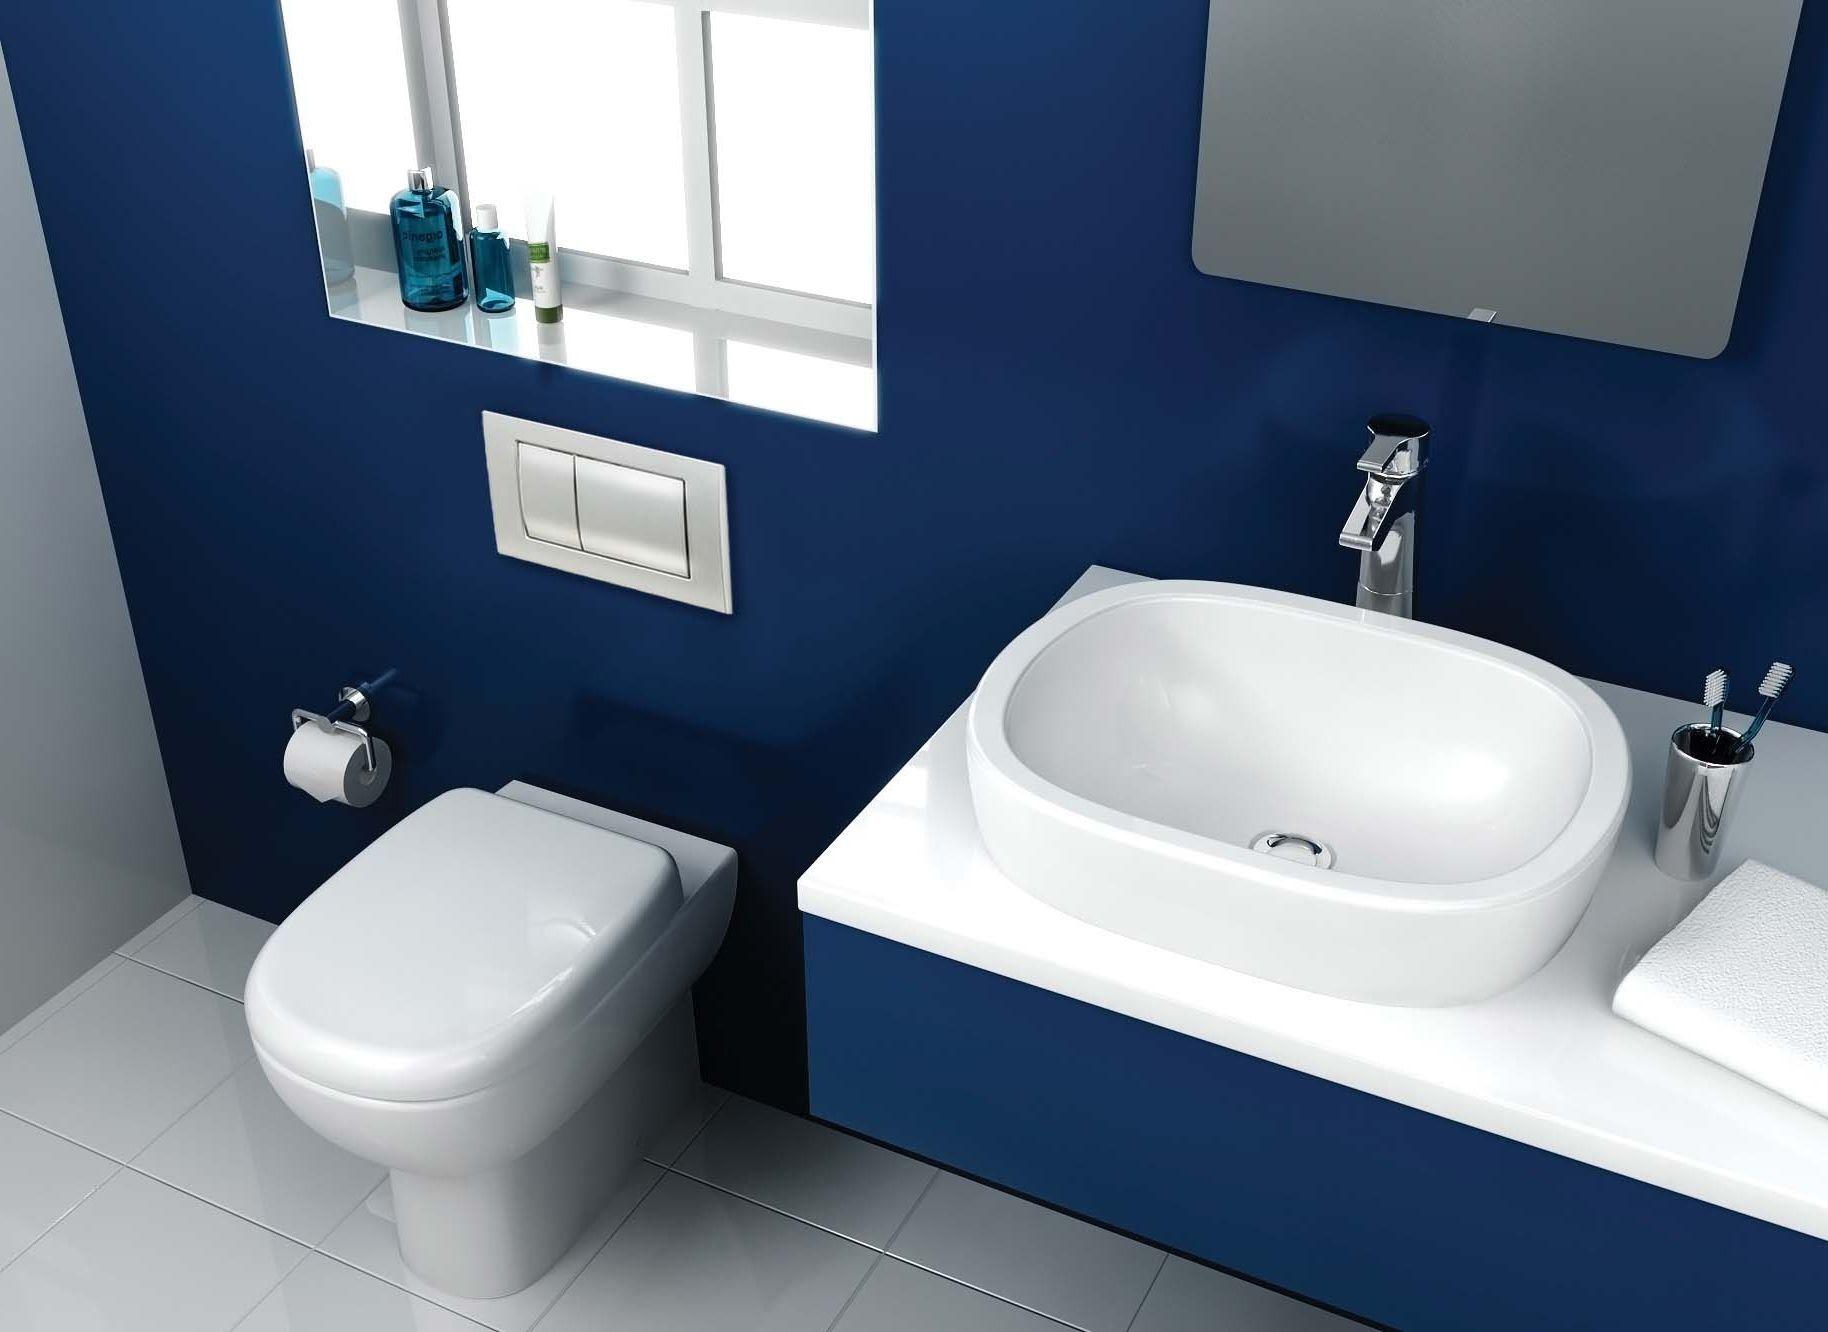 Interior Paint Color Ideas Blue Bathroom Paint Decorating Ideas Simple Bathroom Design Dark Blue Wall Painting Idea Paint Color Ideas Blue Wall Colors Desi Casas